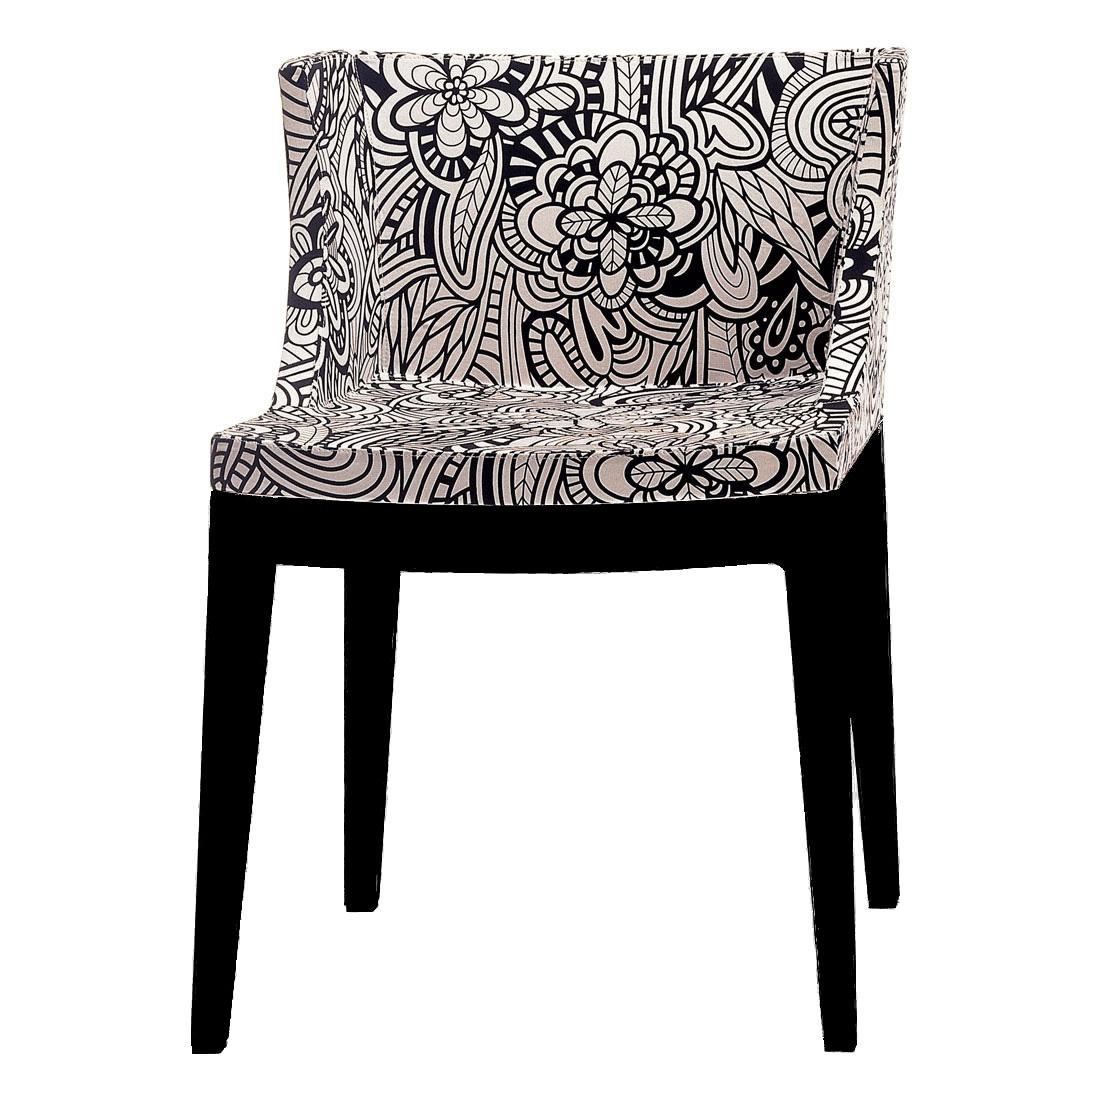 buy the kartell mademoiselle missoni cartagena chair online -  kartell mademoiselle missoni cartagena chair